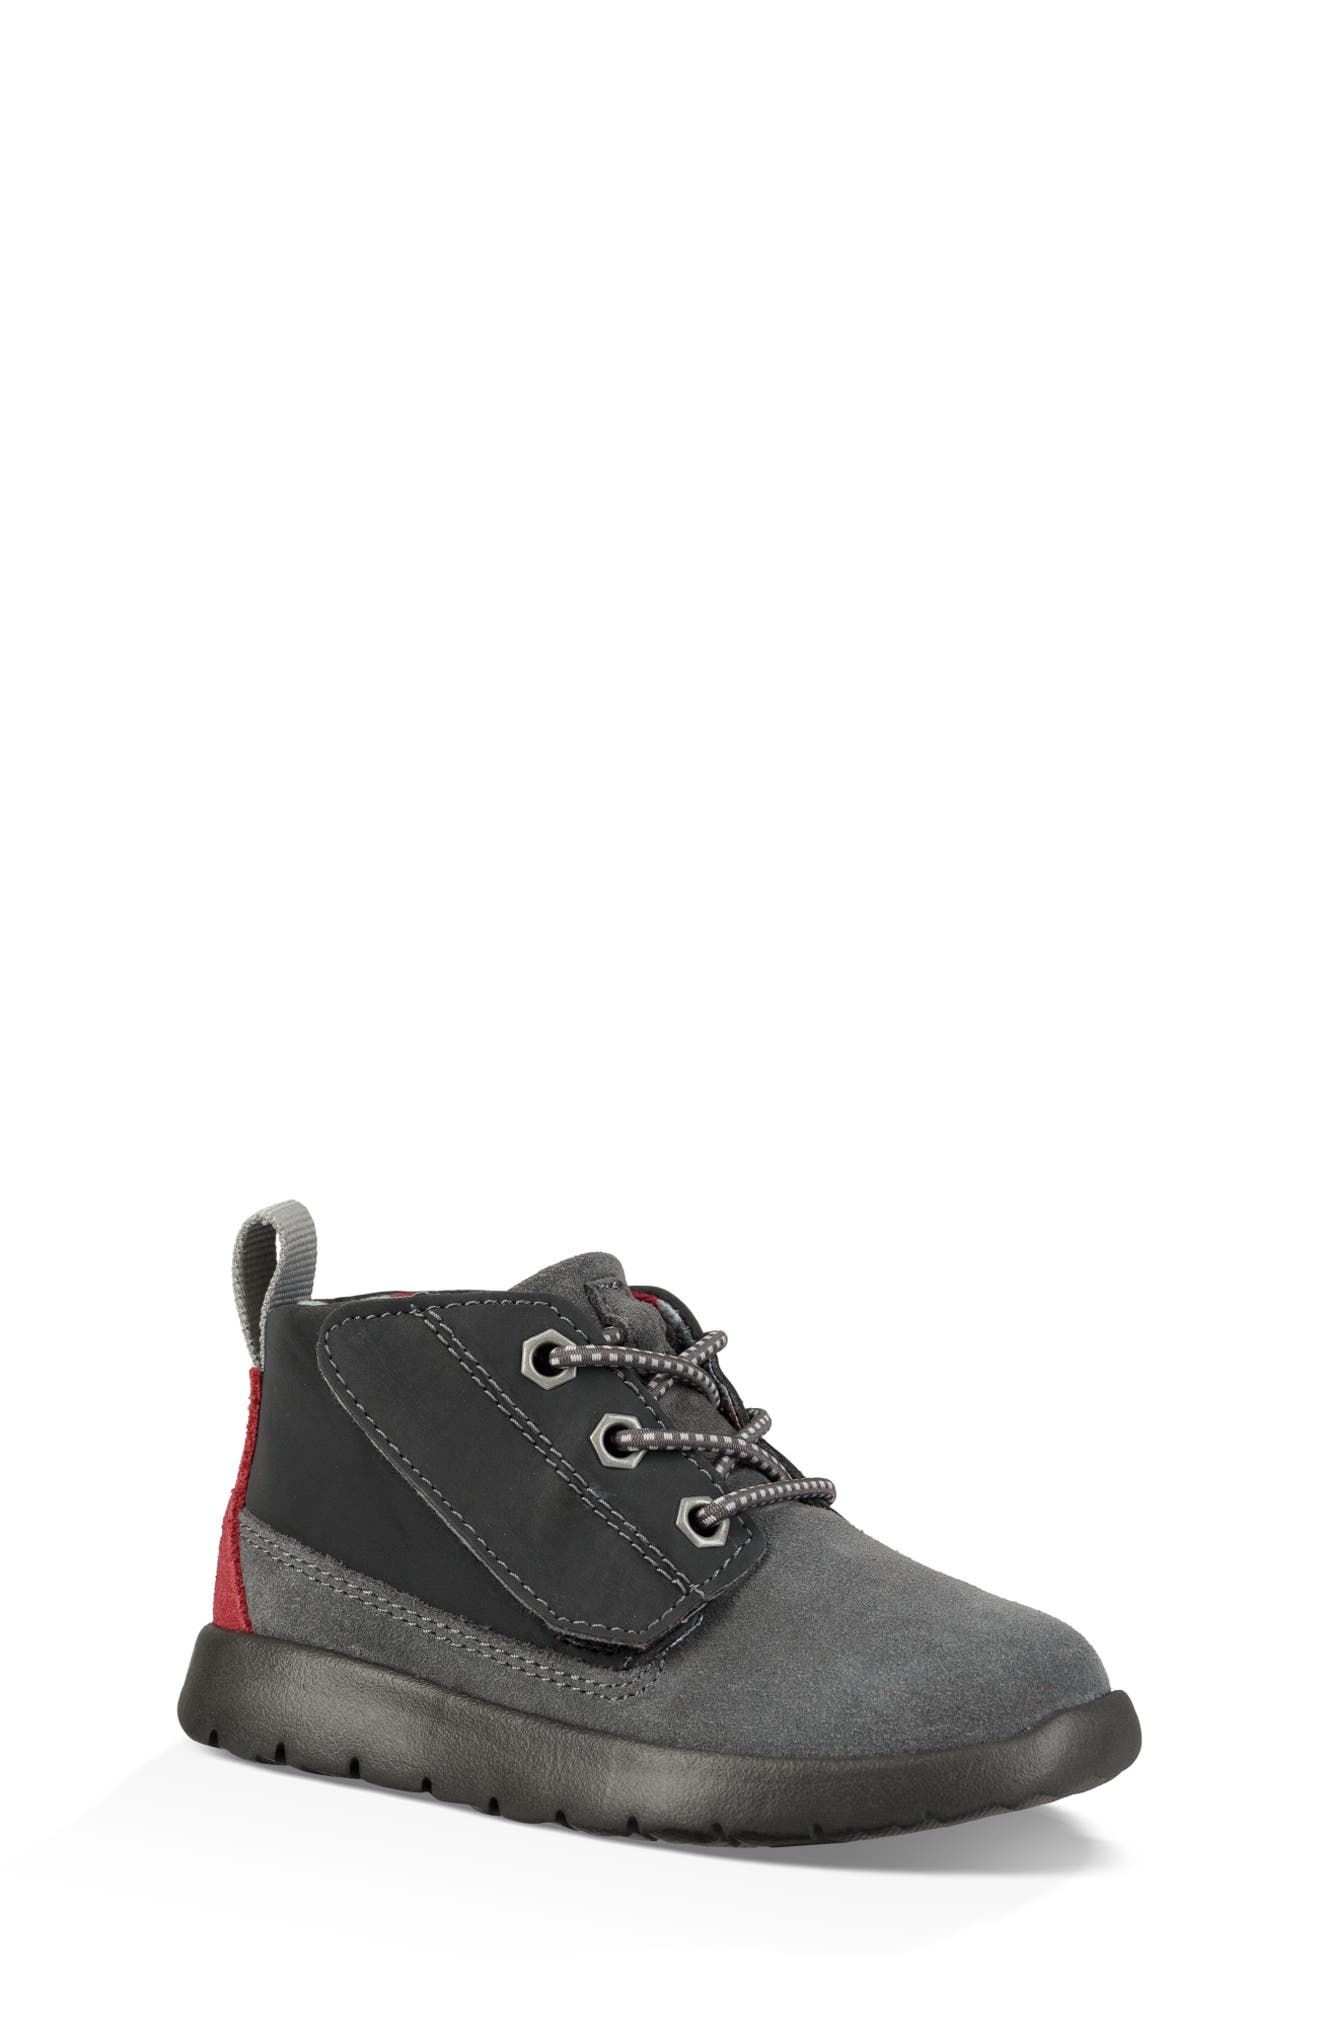 Canoe Chukka Sneaker,                             Main thumbnail 1, color,                             GREY / BLACK